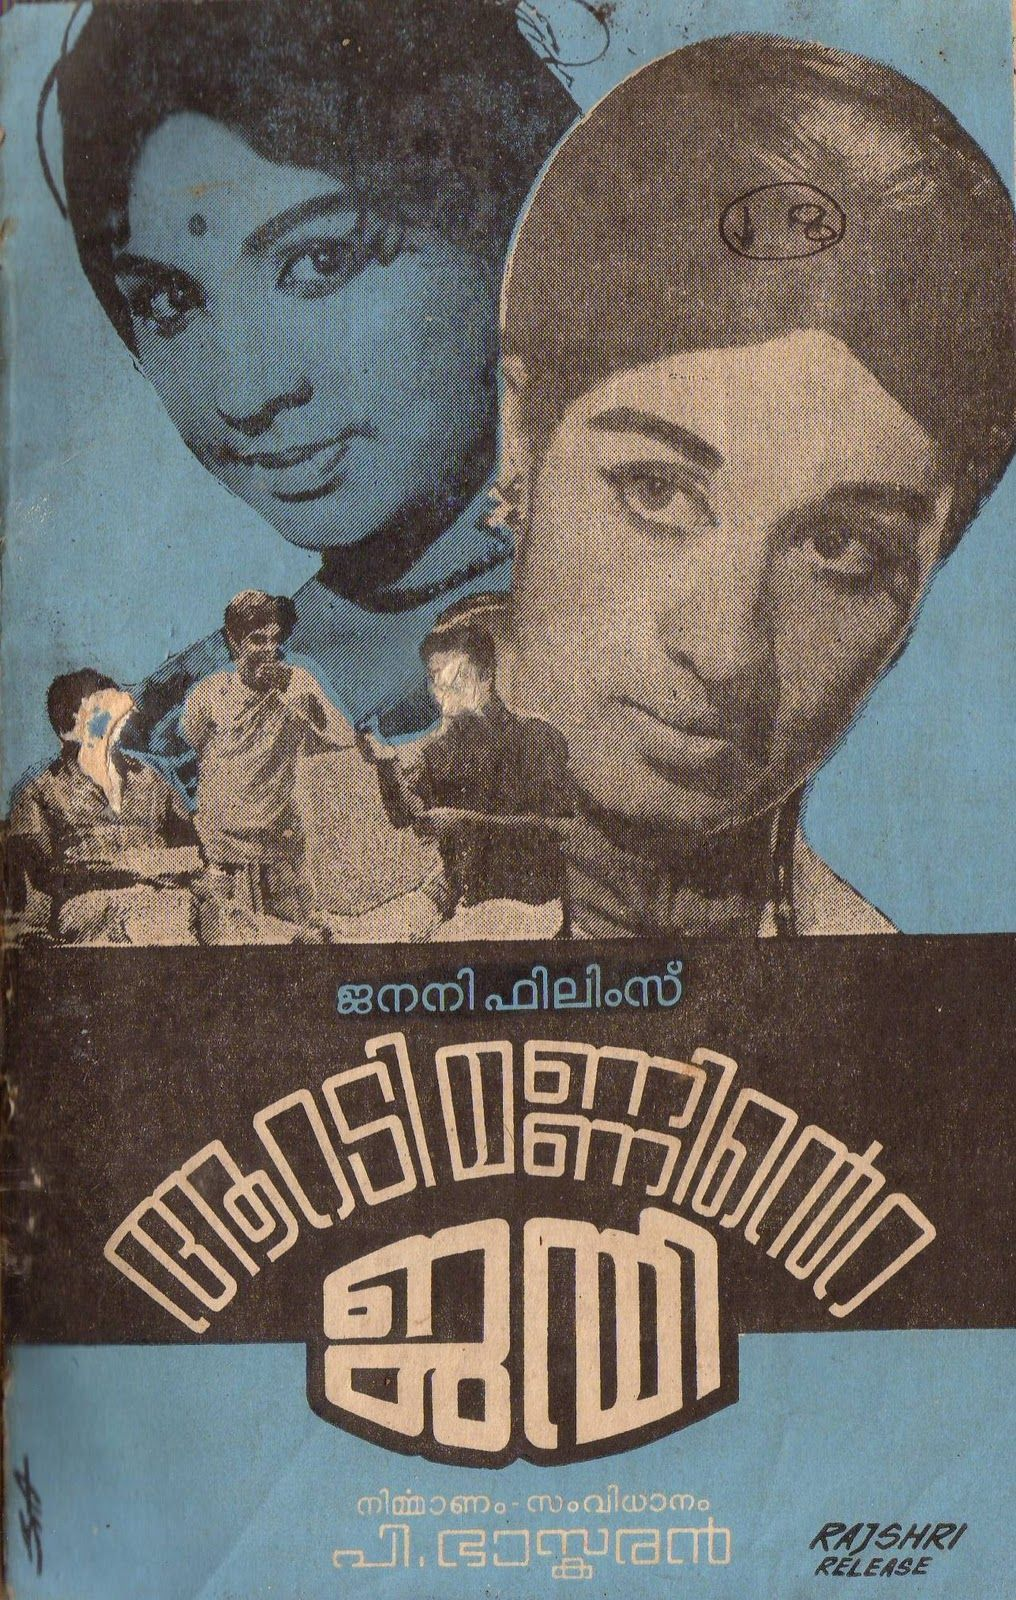 Aaradi Maninte Janmi Retro Art Poster Art Vintage India